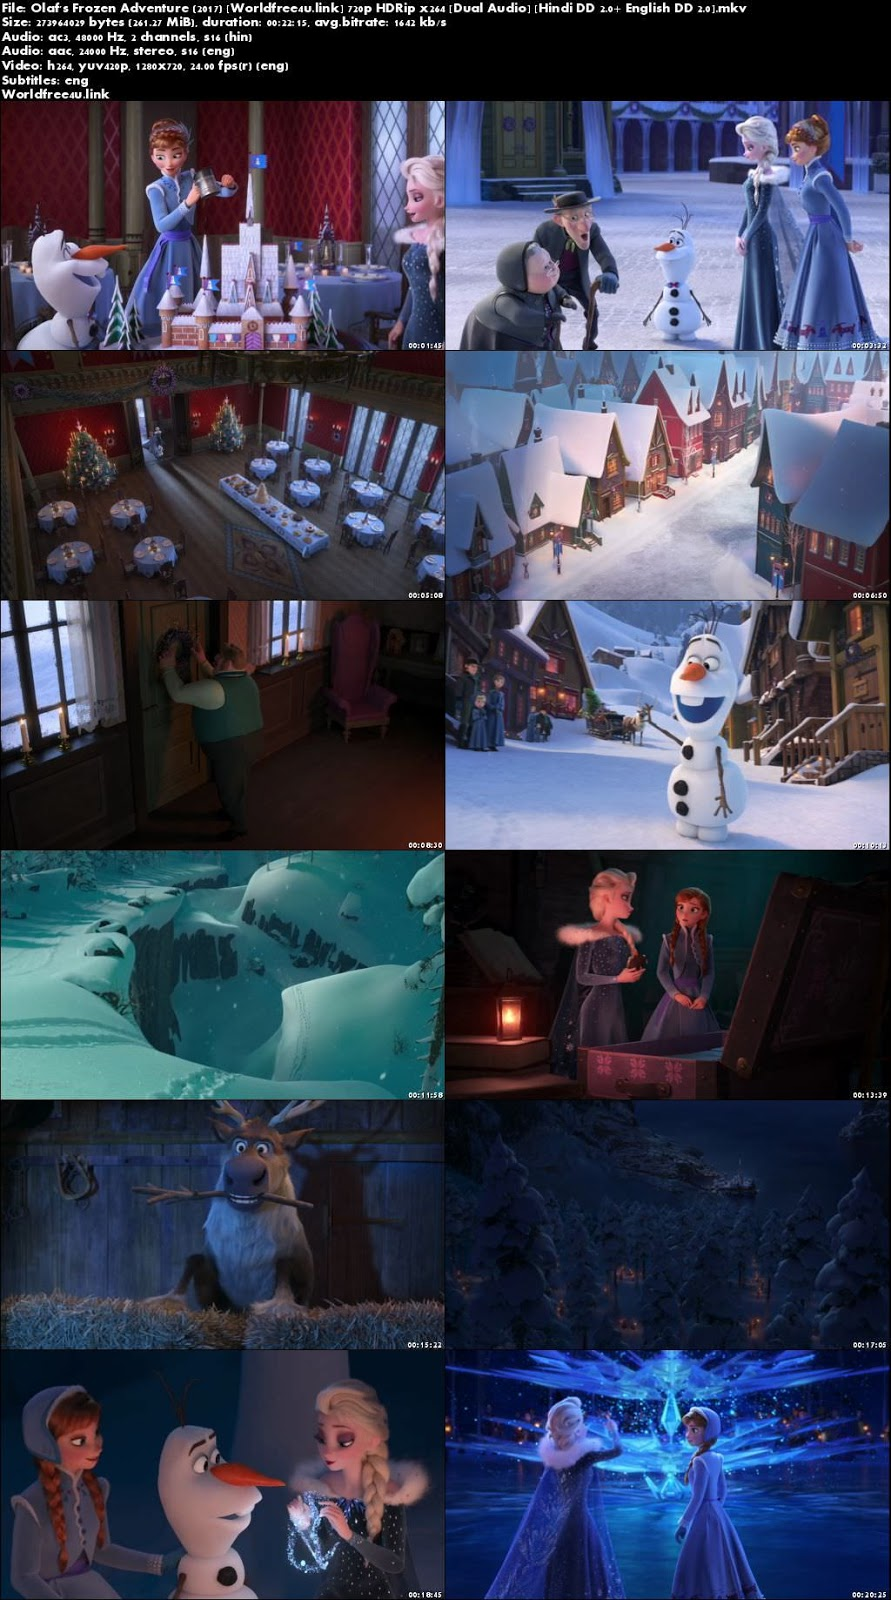 Screen Shoot of Olaf's Frozen Adventure 2017 HDRip 720p Dual Audio Hindi English